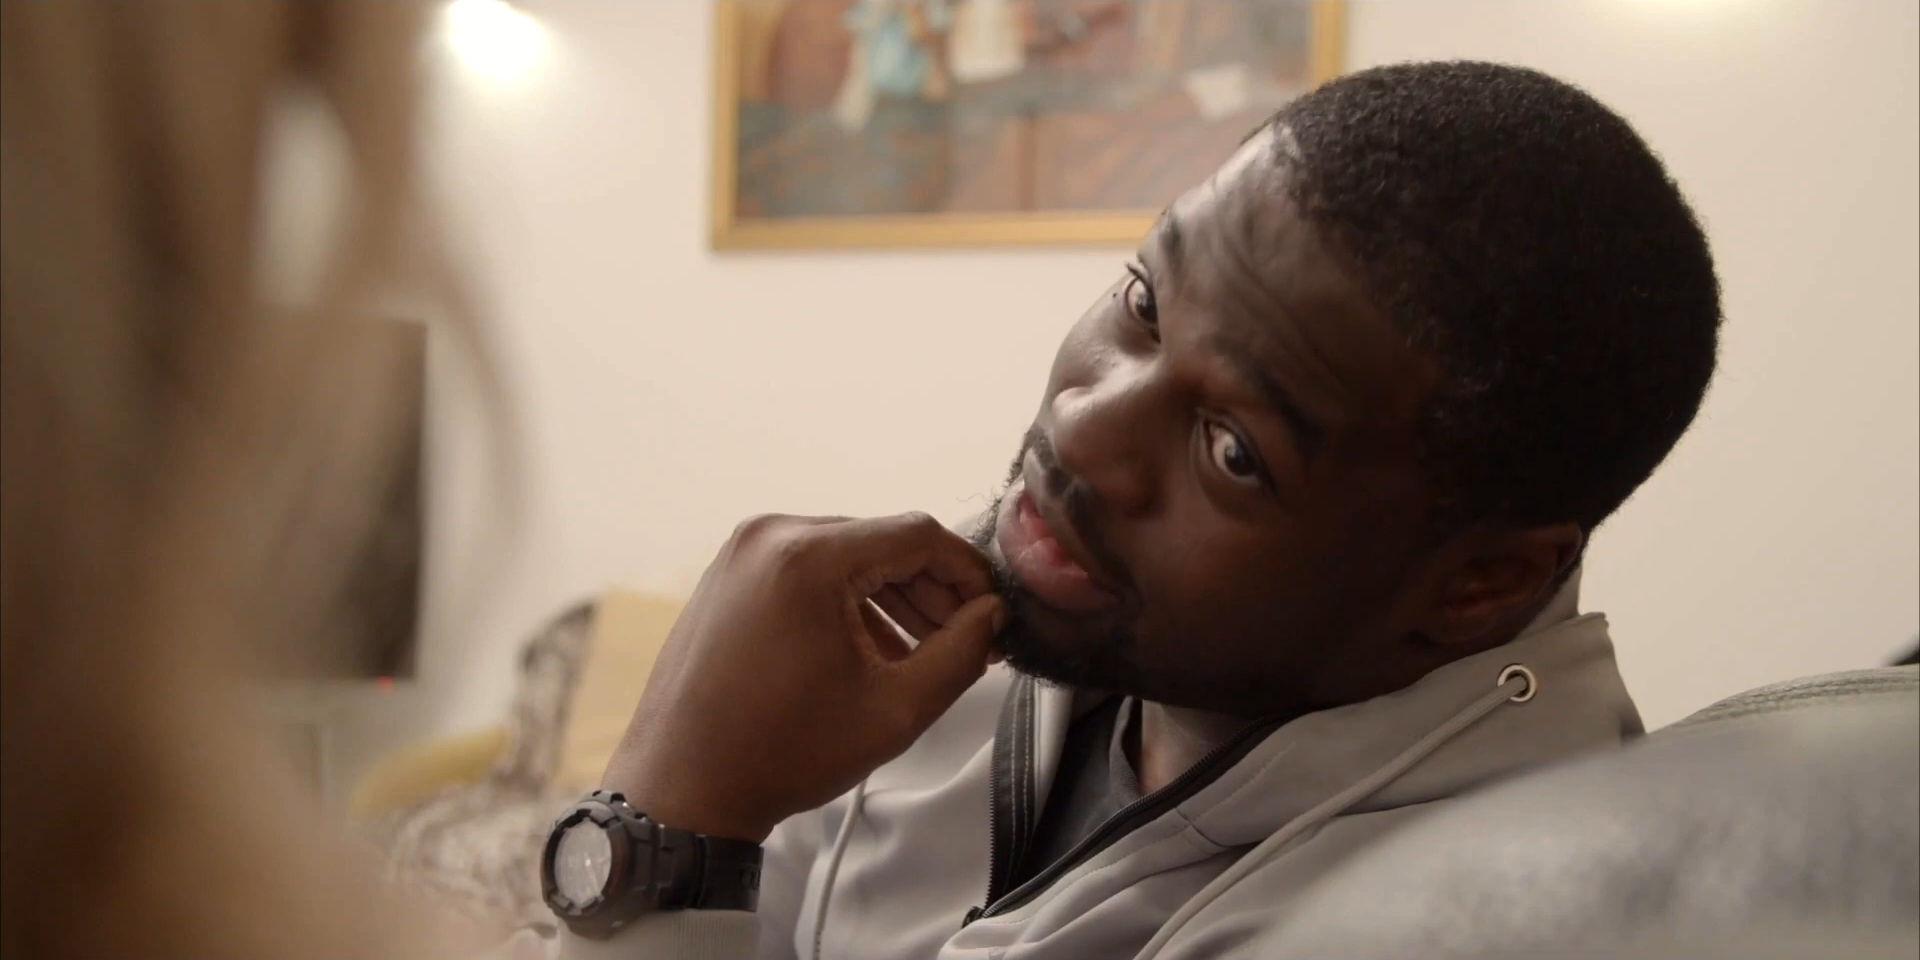 Still from short film Fraudsters featuring Trésor Cédric, produced by Fresh Media Productions